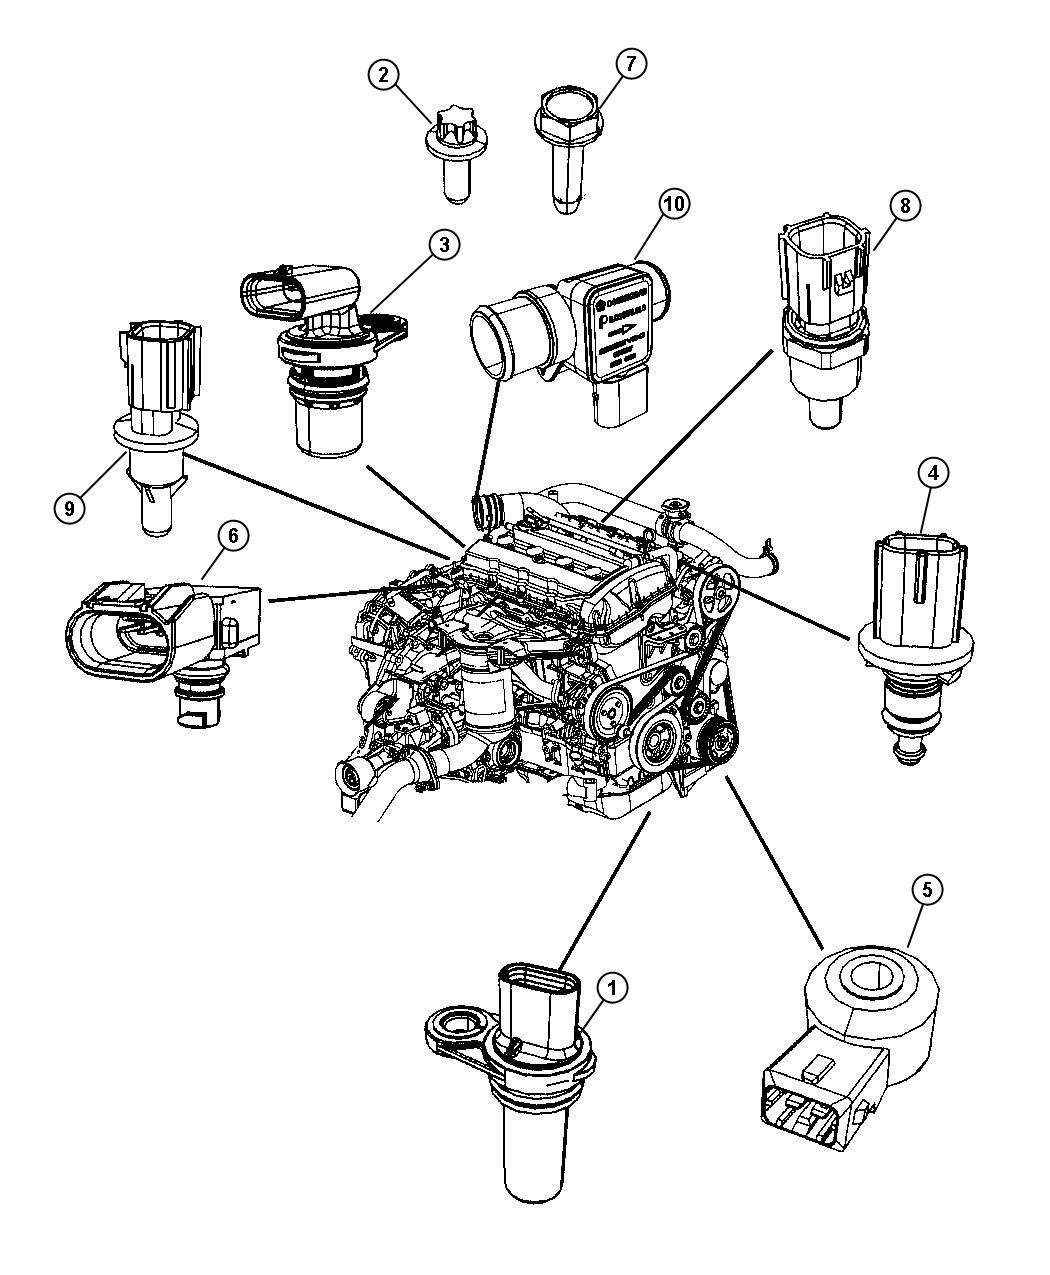 2009 dodge journey sensors engine